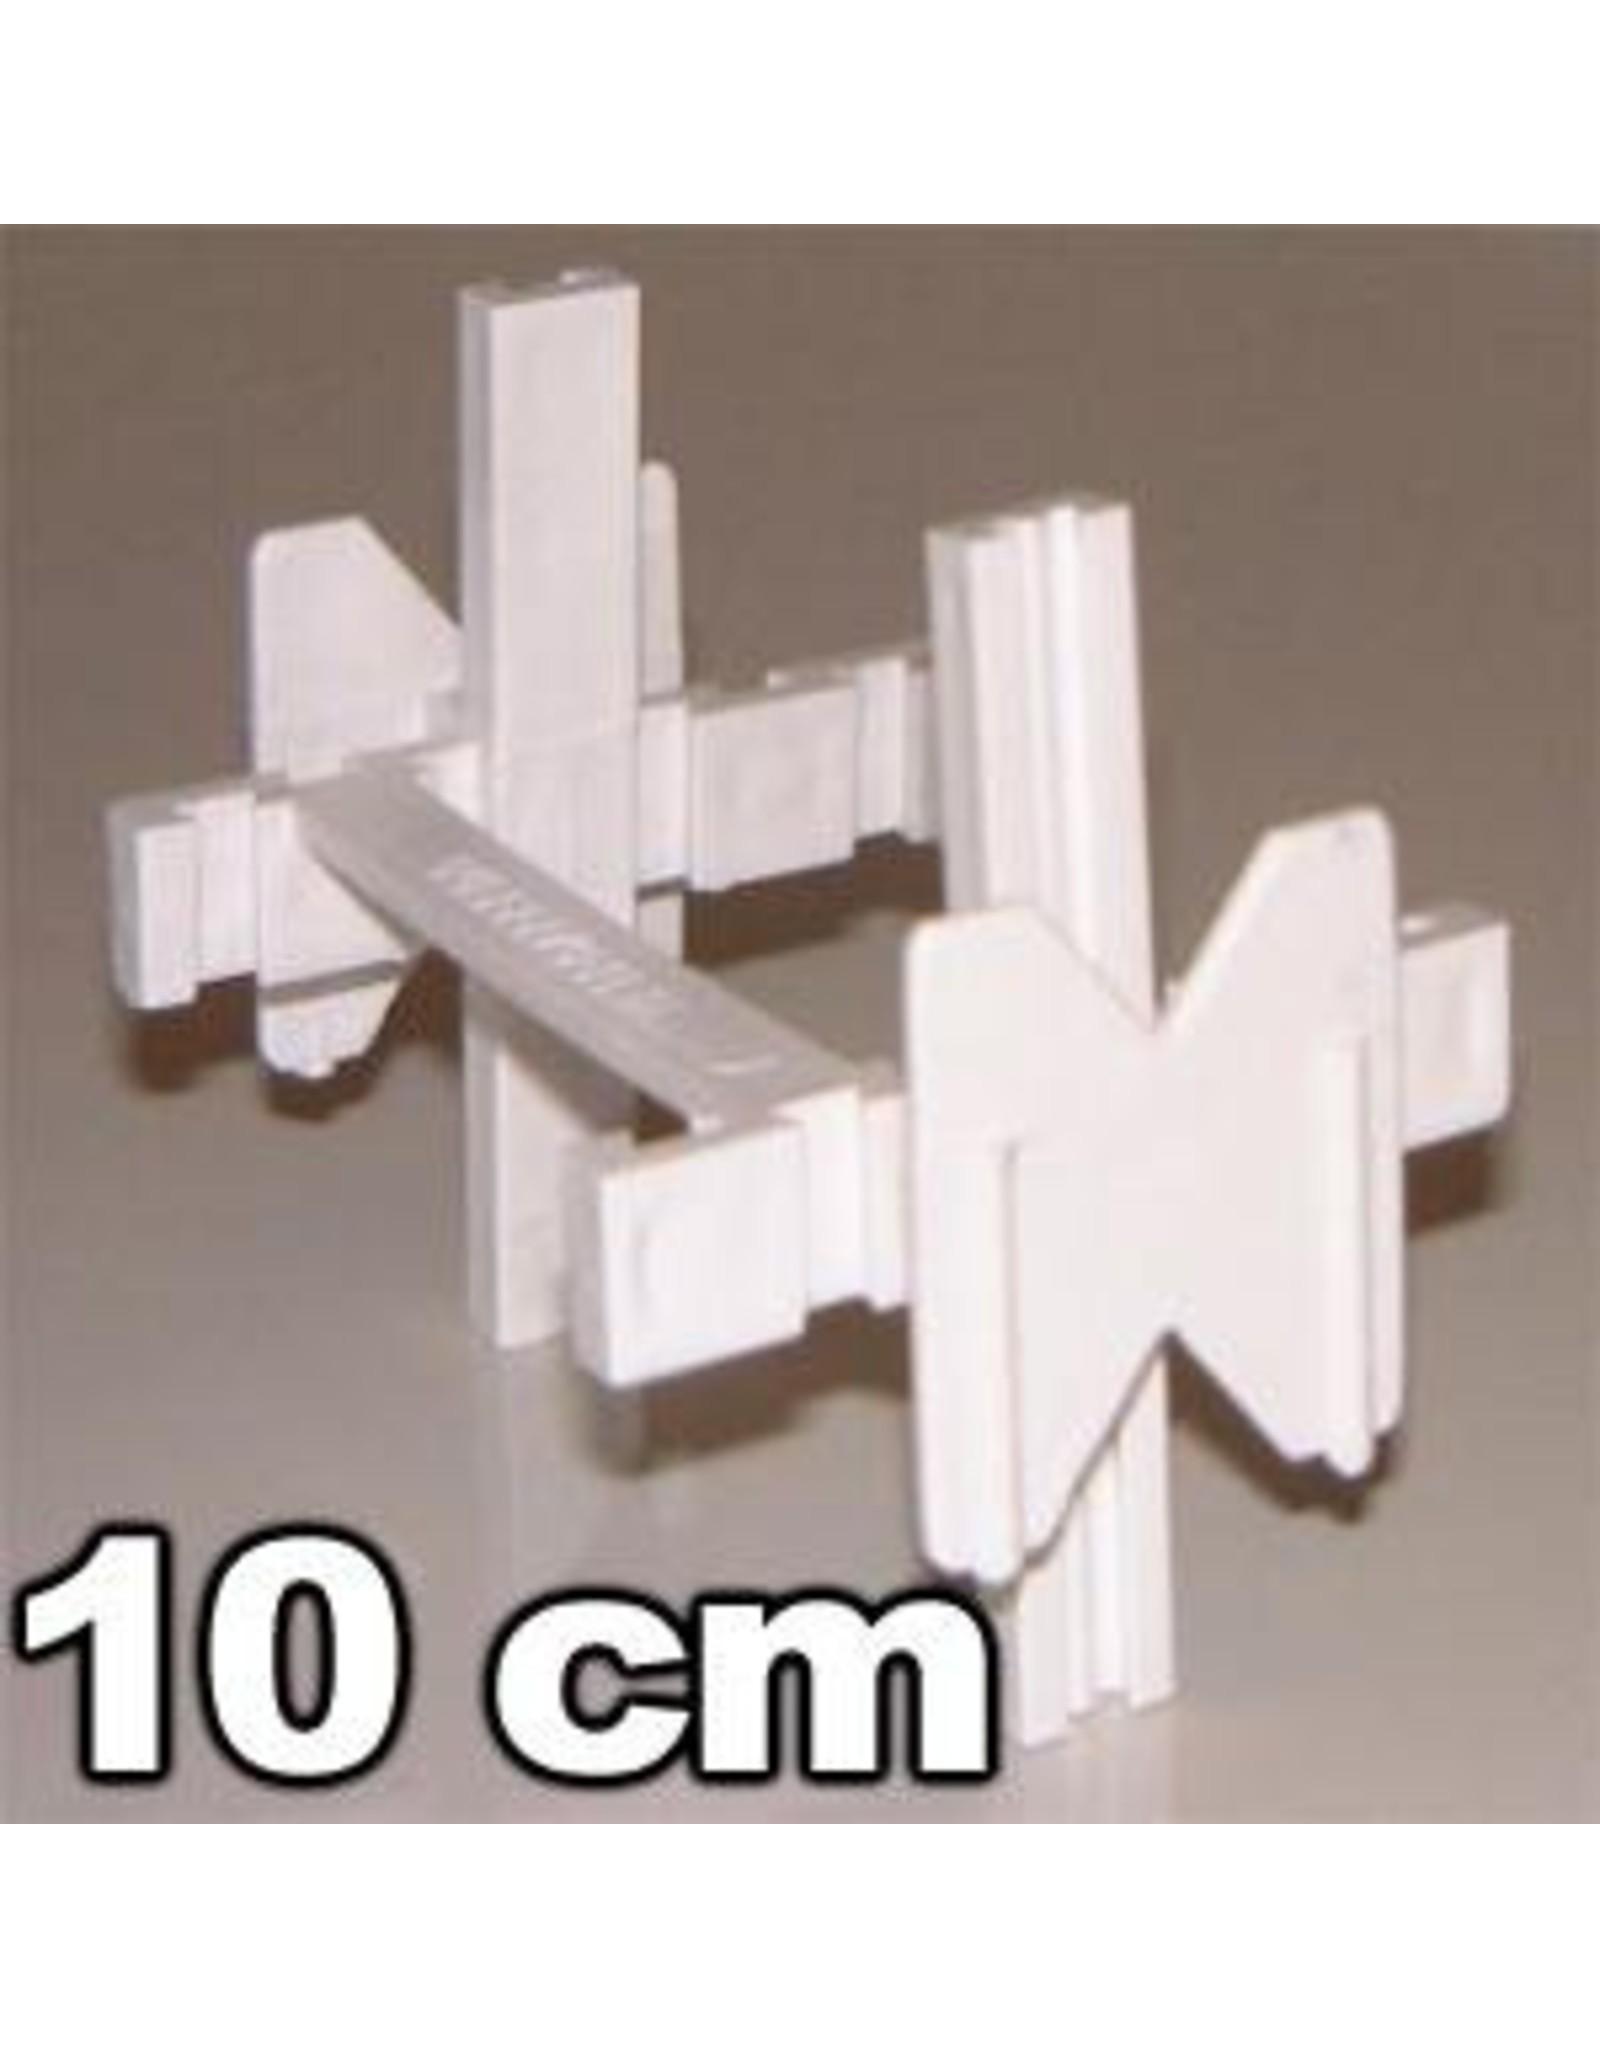 Verlege kreuze 10cm 25stuck